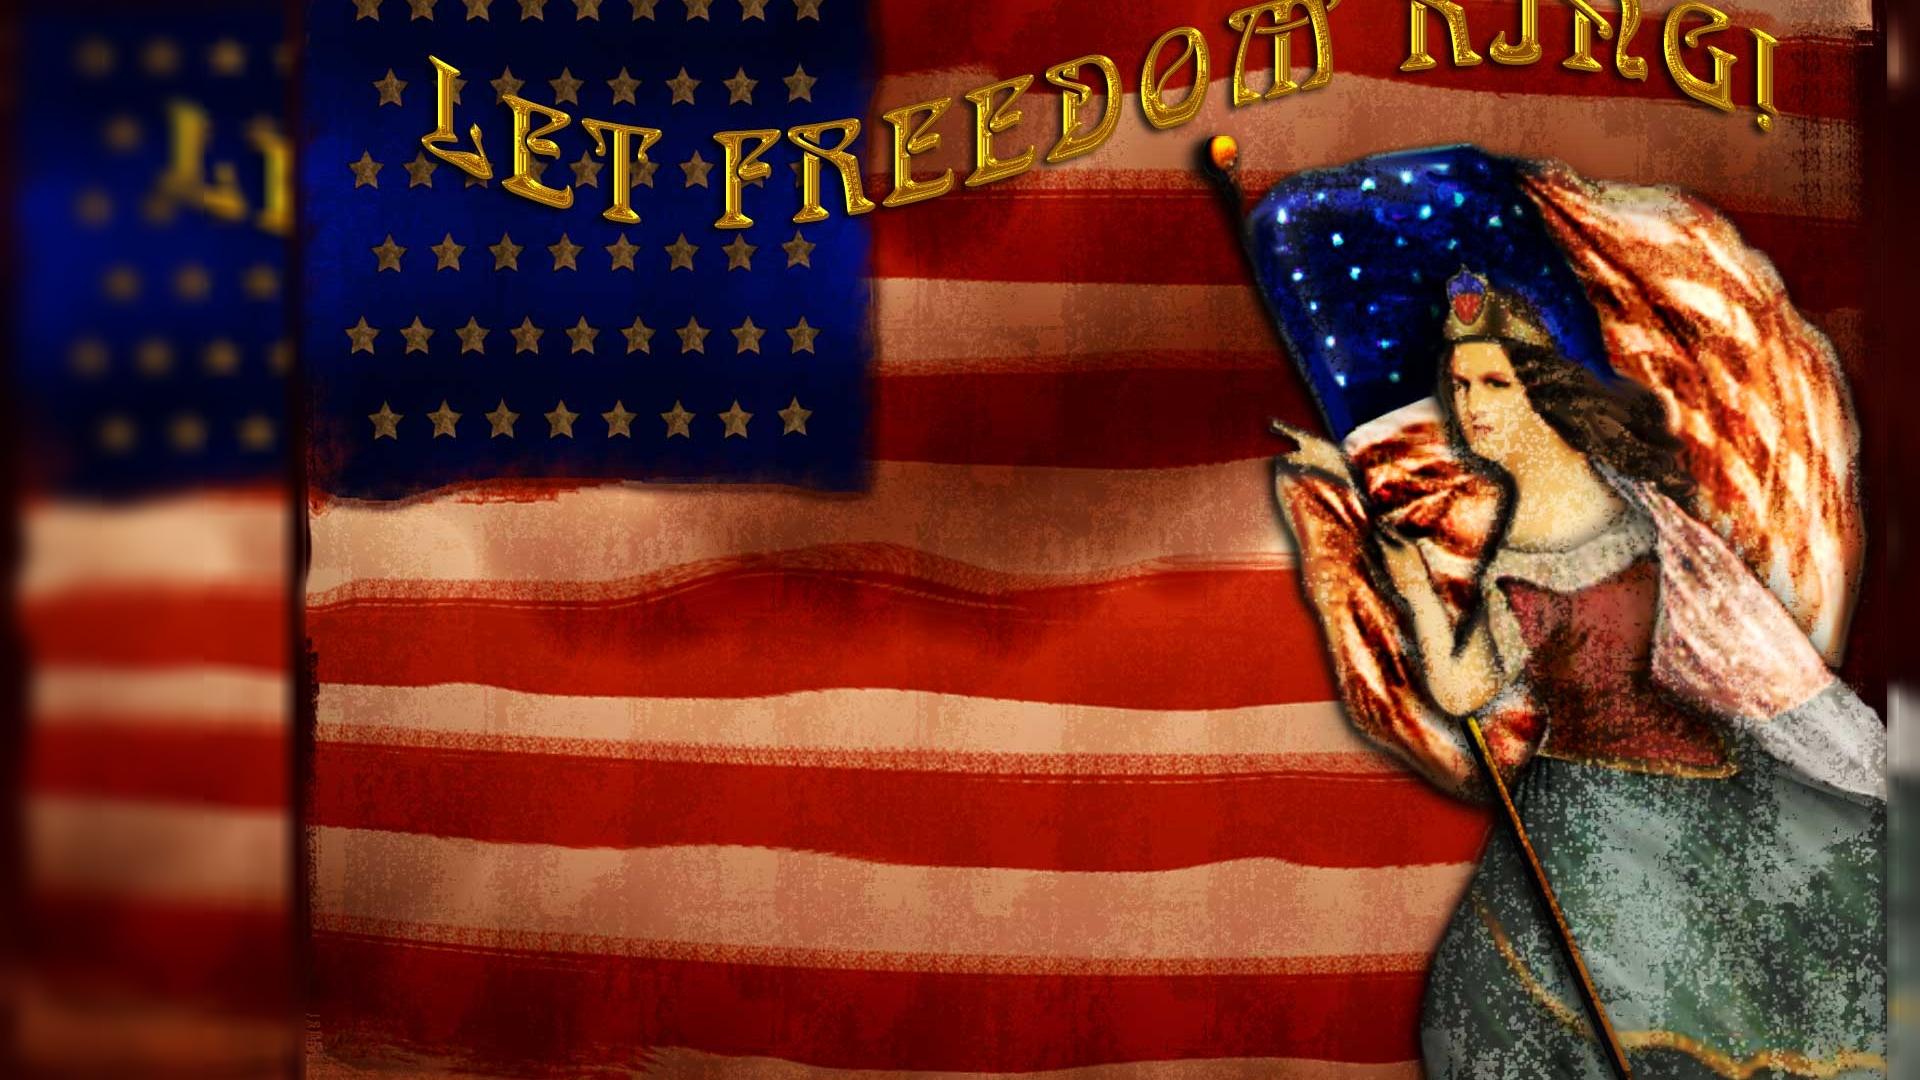 Patriotic Backgrounds wallpaper Vintage Patriotic Backgrounds 1920x1080